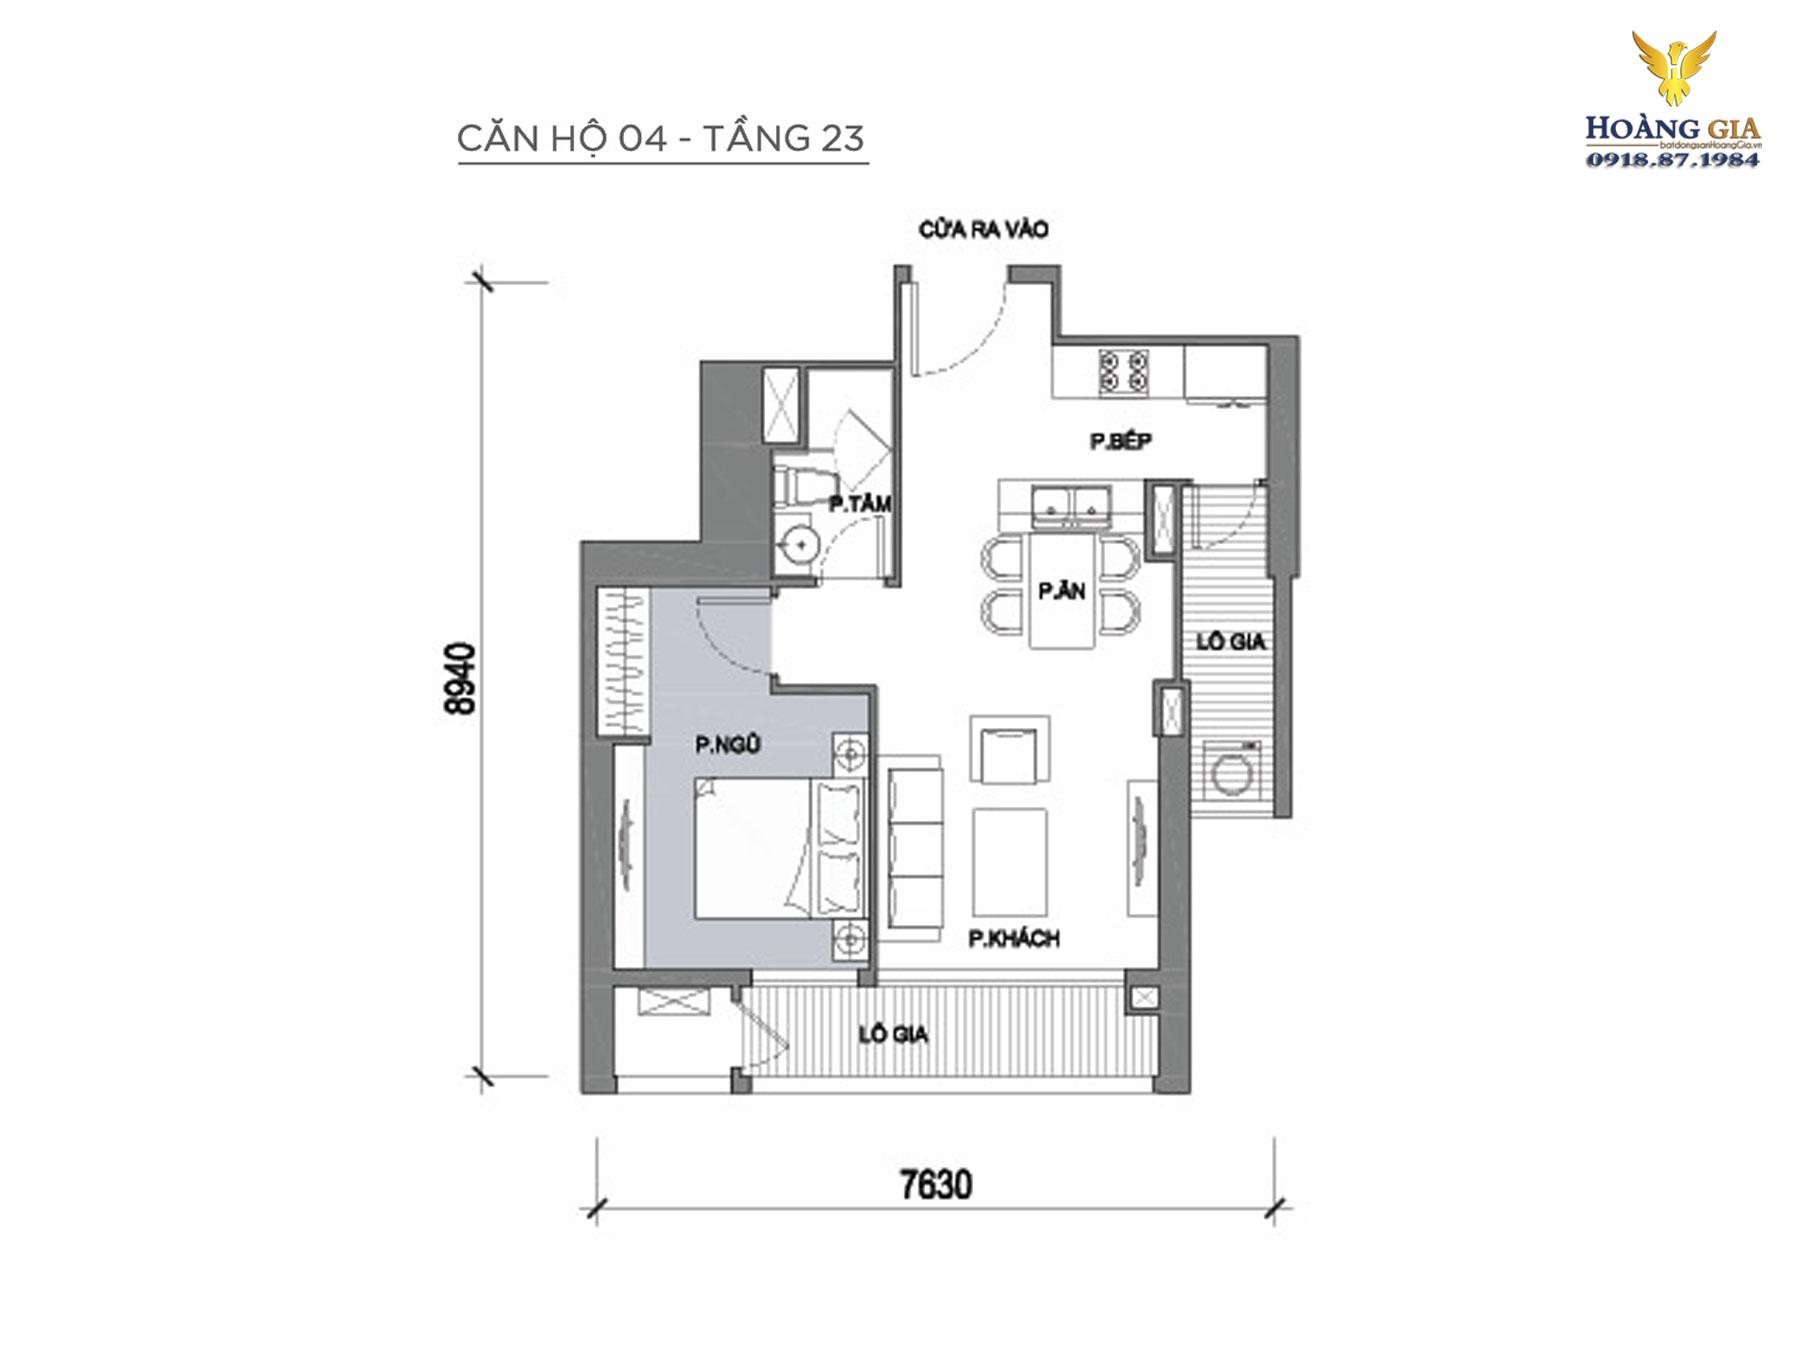 Căn hộ số 04 tầng 23 Vinhomes Central Park